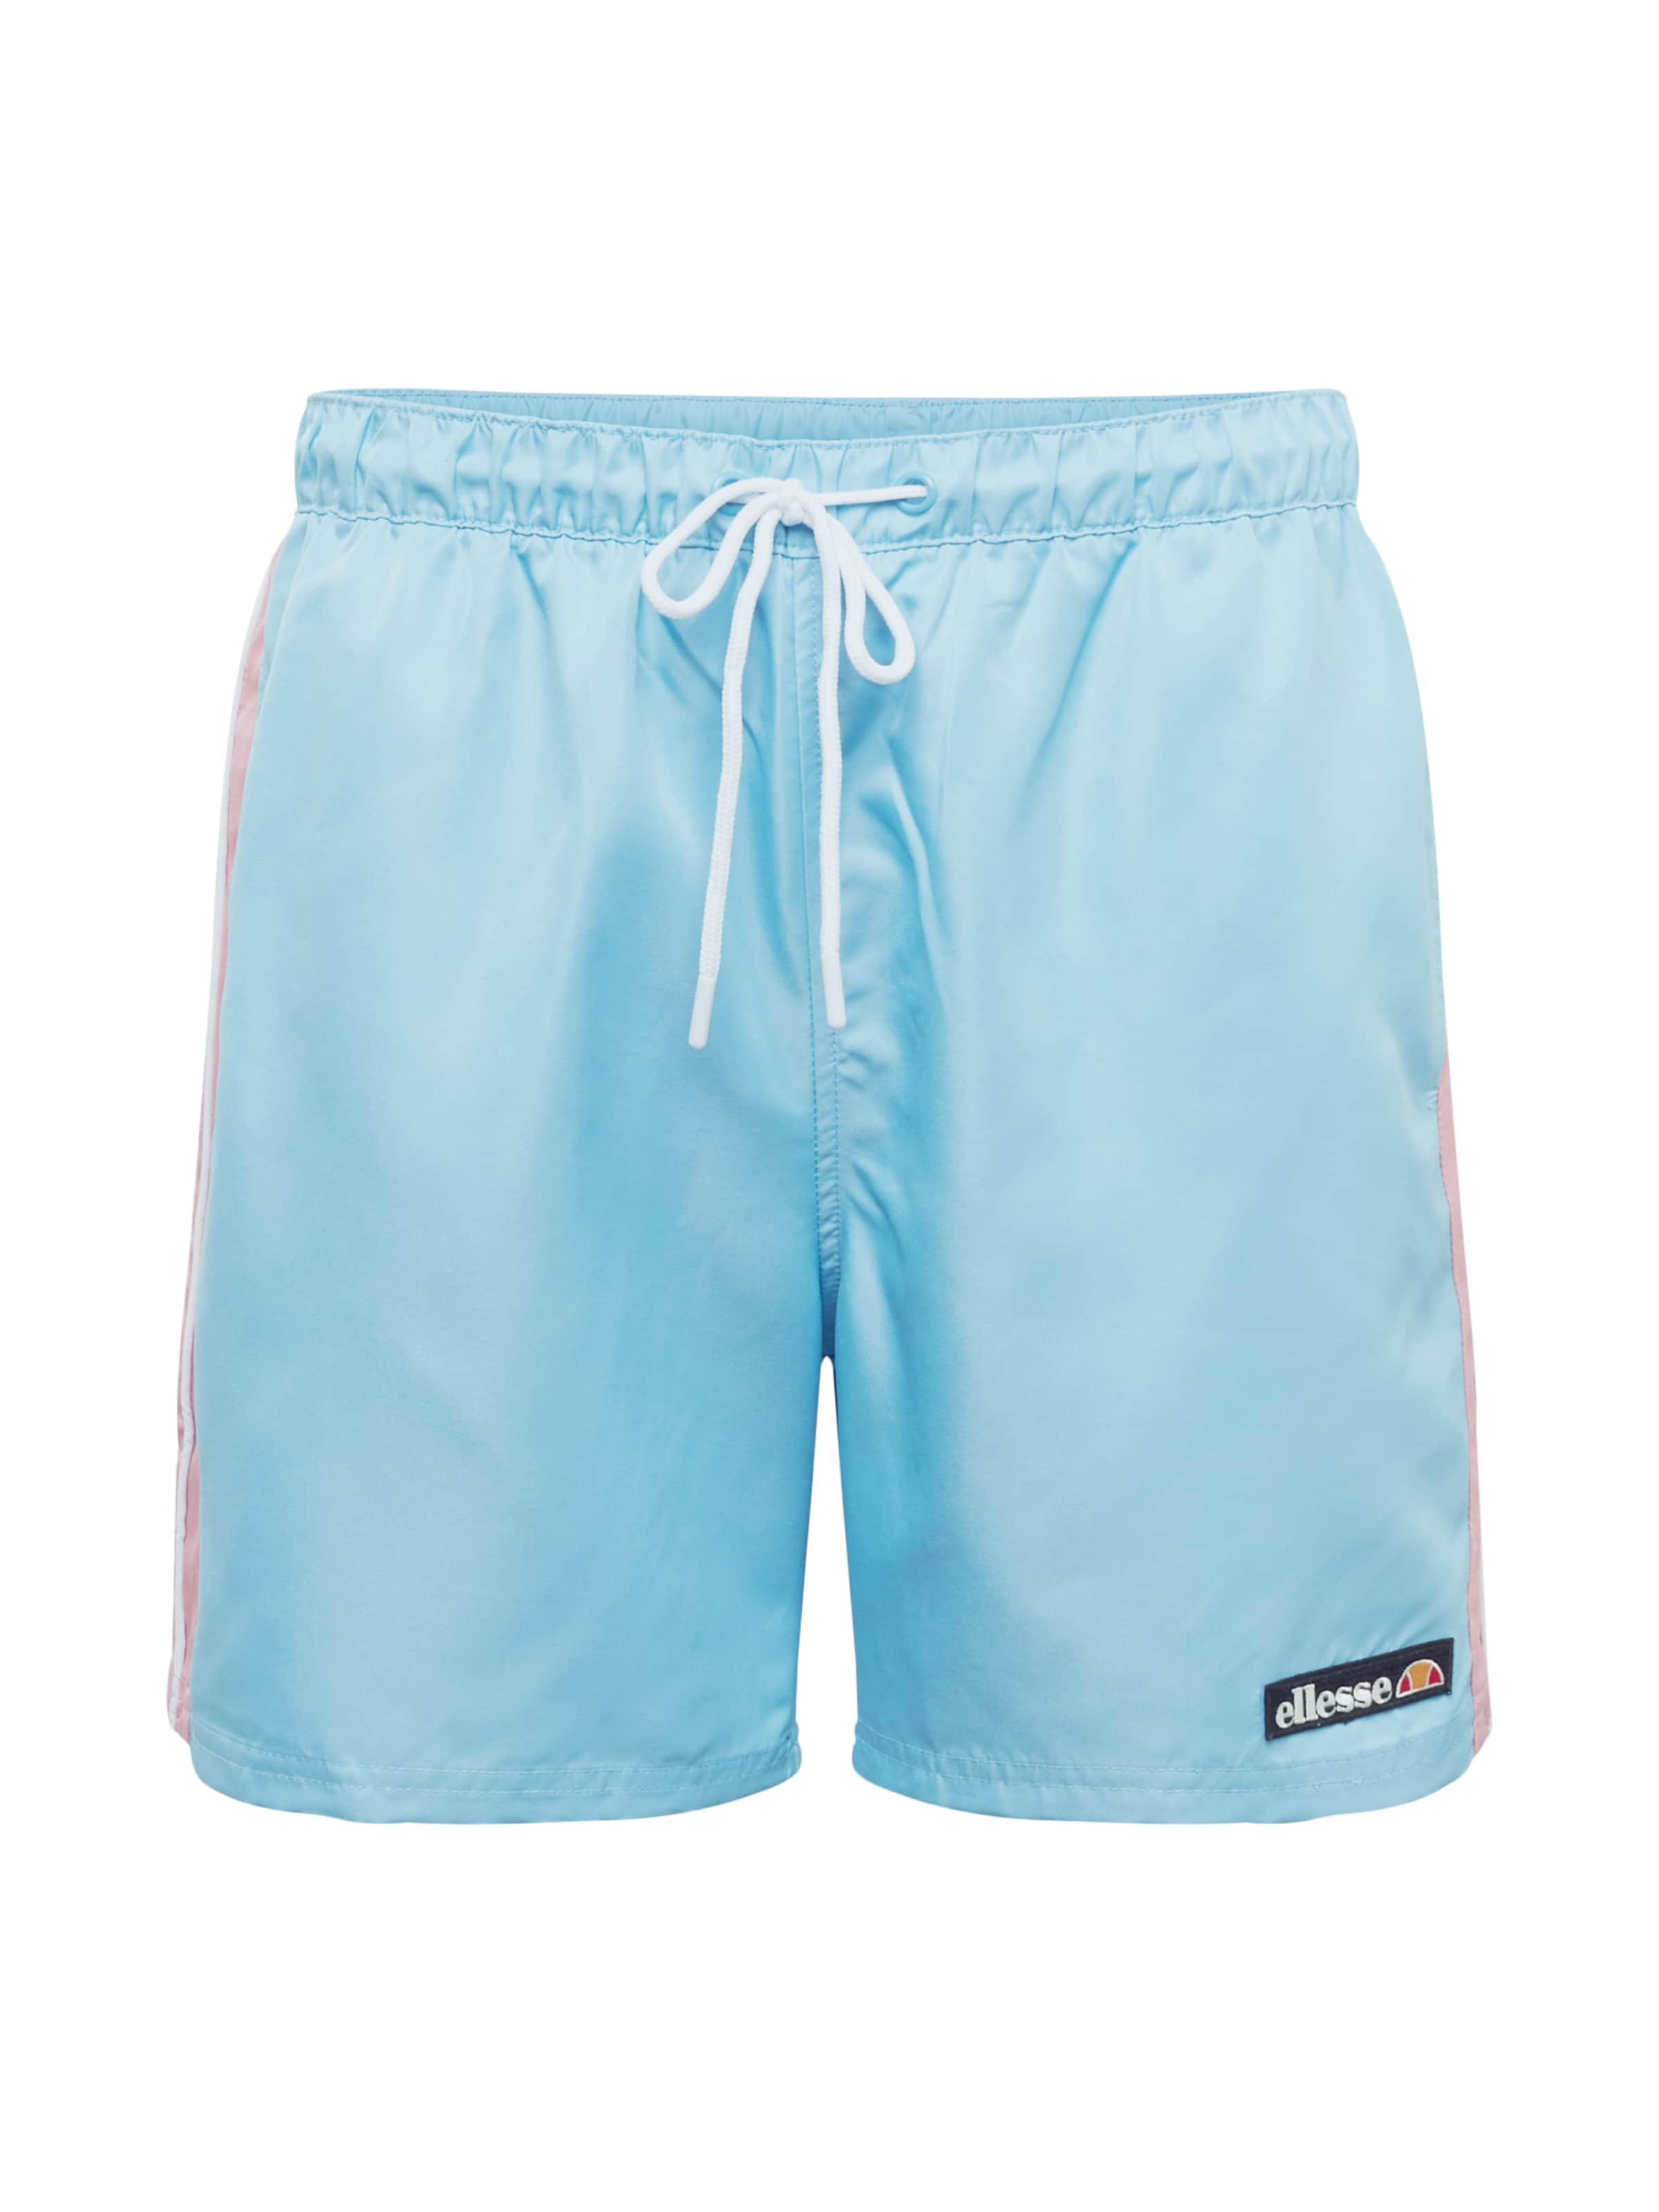 Ellesse Pantalon 'apiro' MarineBlanc En Bleu ucF1TlKJ3